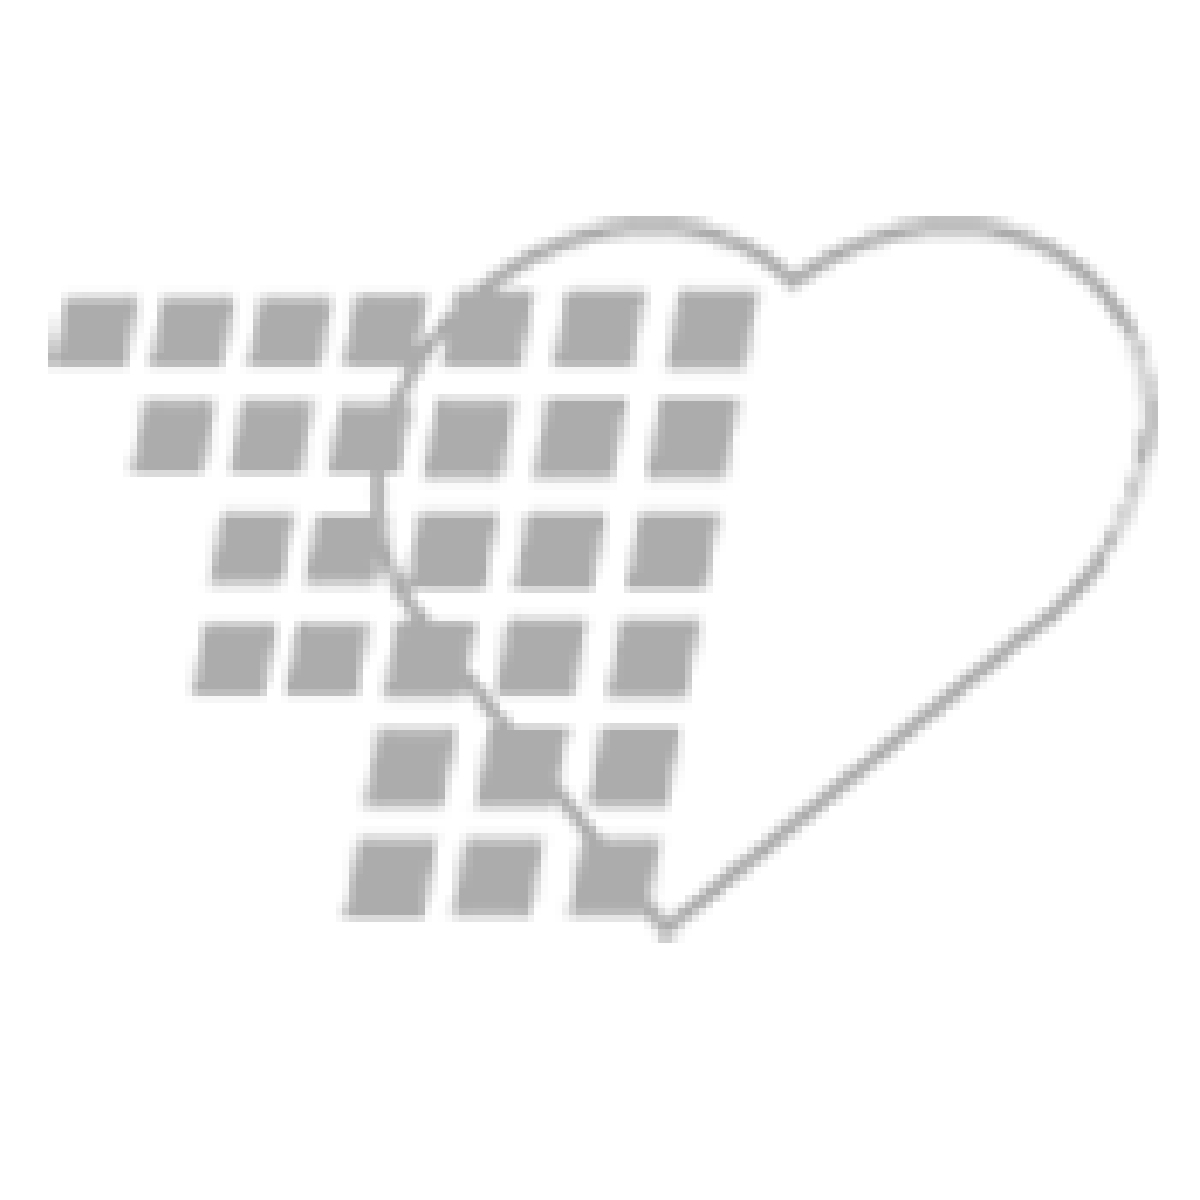 06-93-1135 Demo Dose® Dextros 25% 10mL